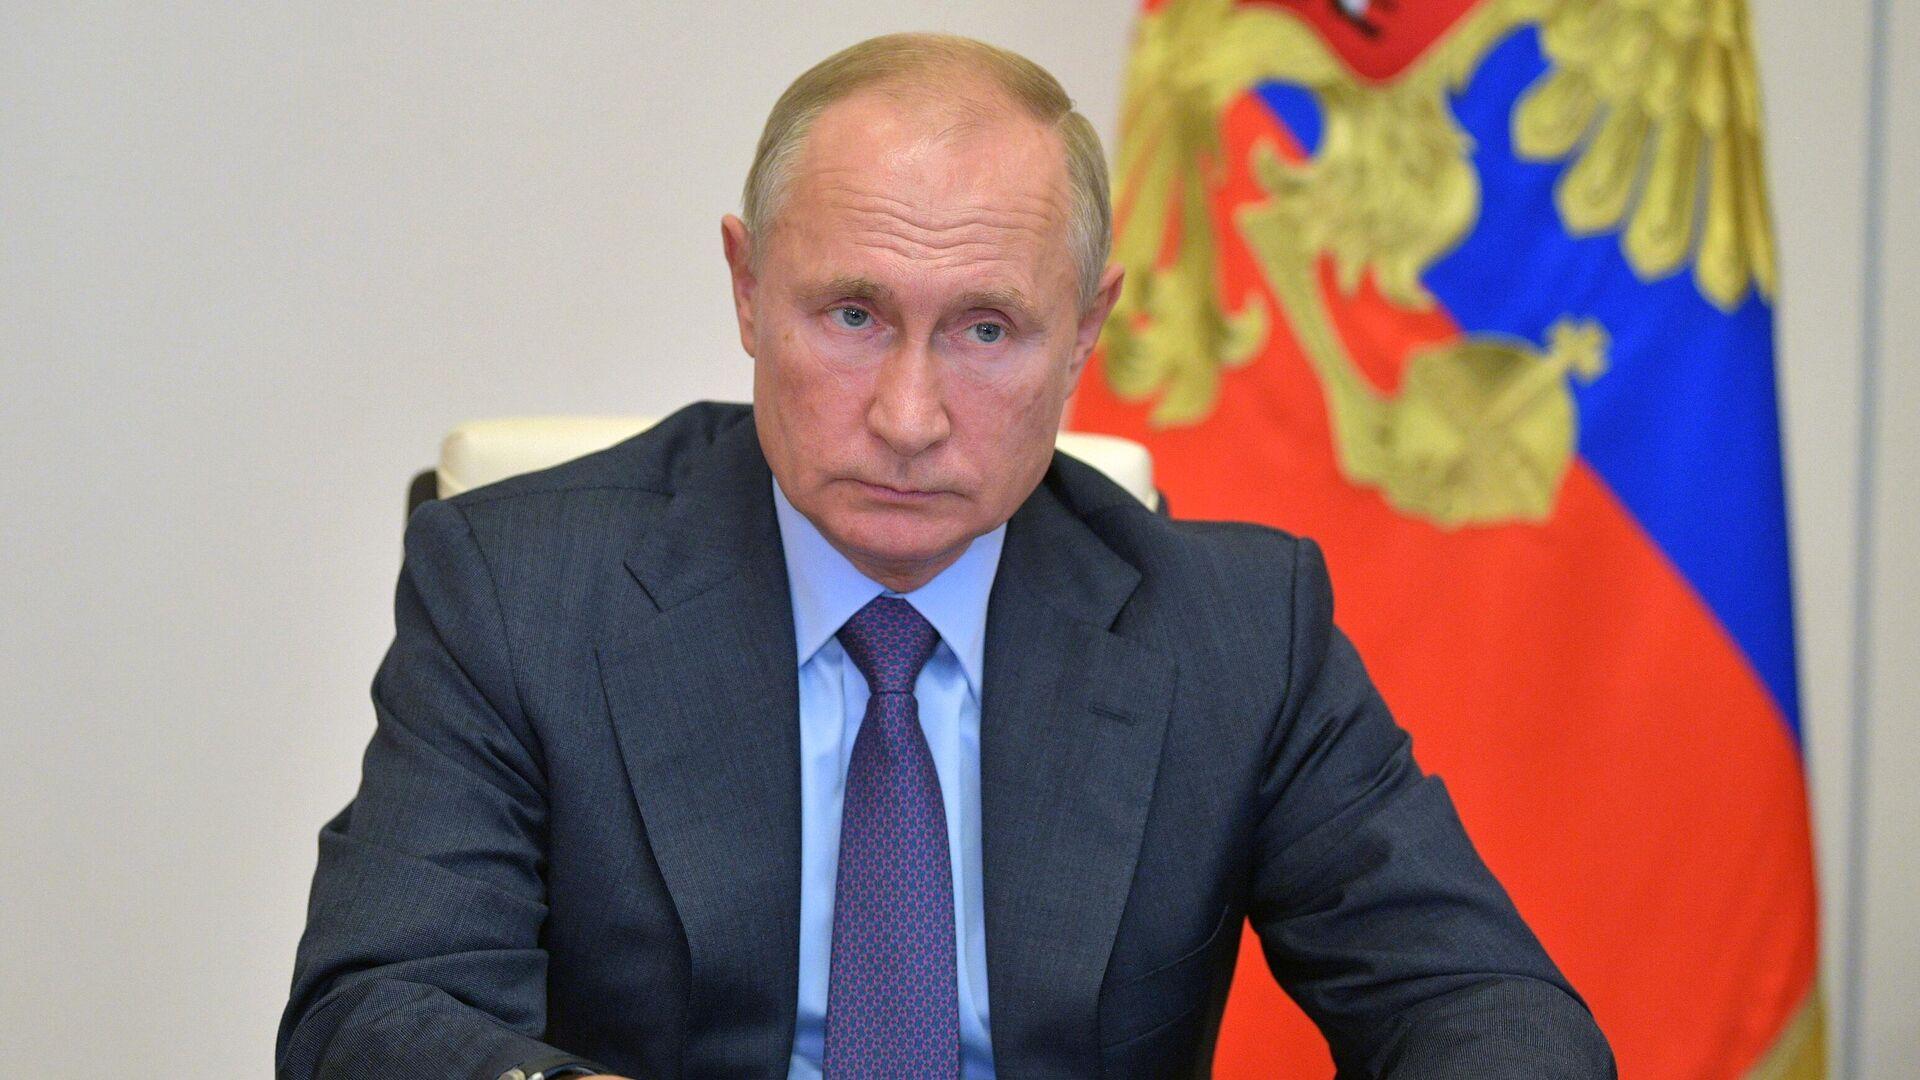 Президент РФ Владимир Путин в режиме видеоконференции проводит совещание о развитии и декриминализации лесного комплекса - РИА Новости, 1920, 30.09.2020